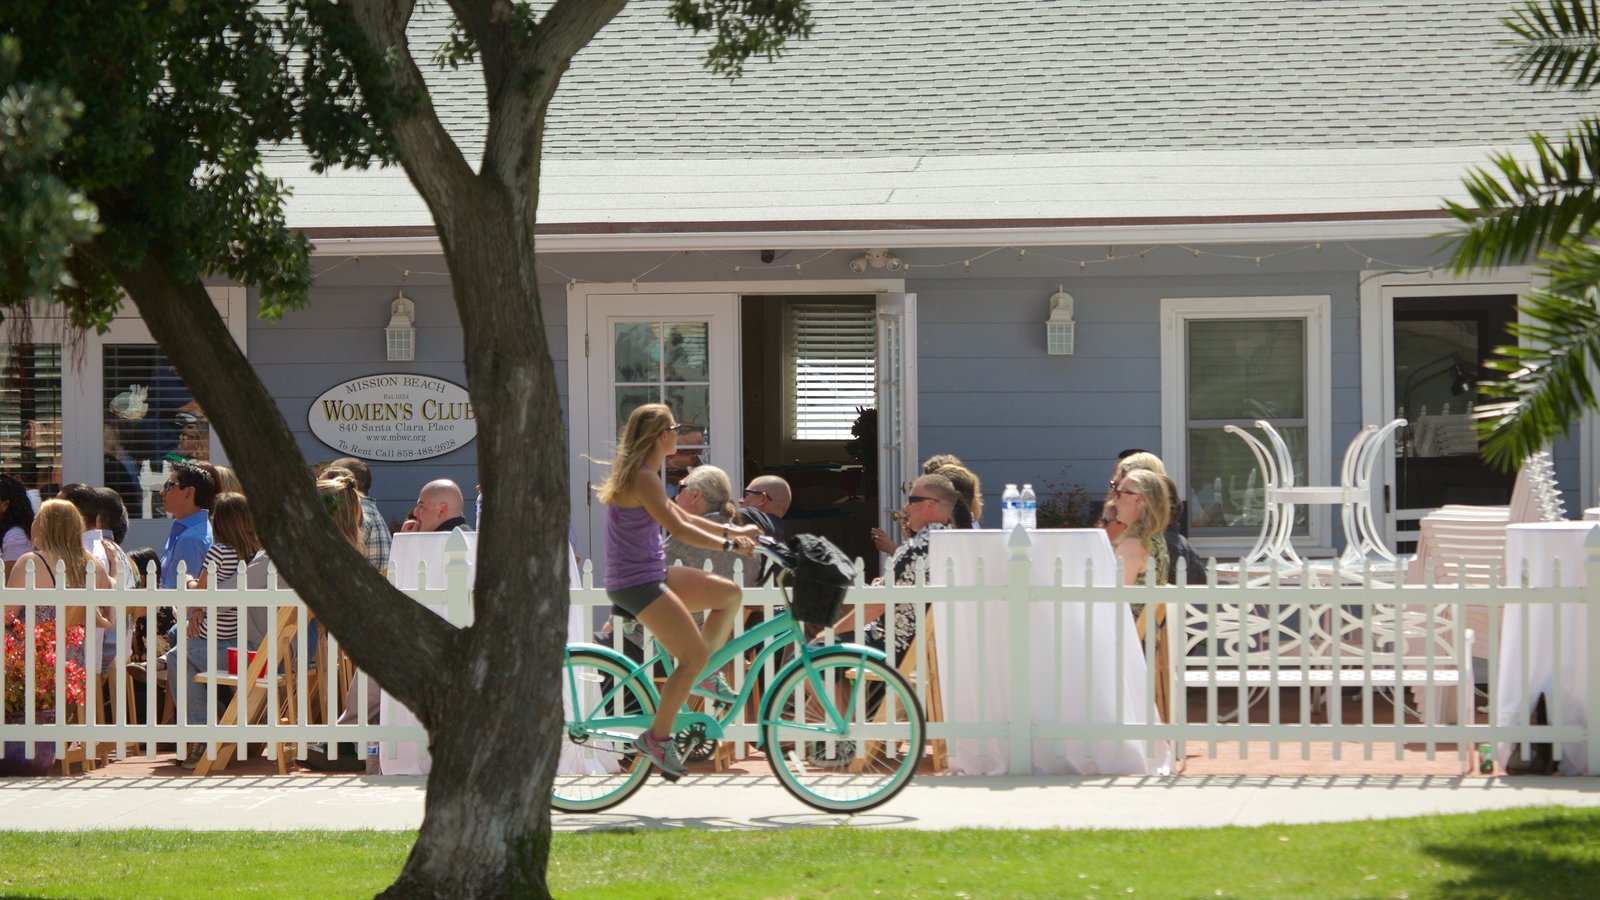 Mission Bay mostrando ciclismo